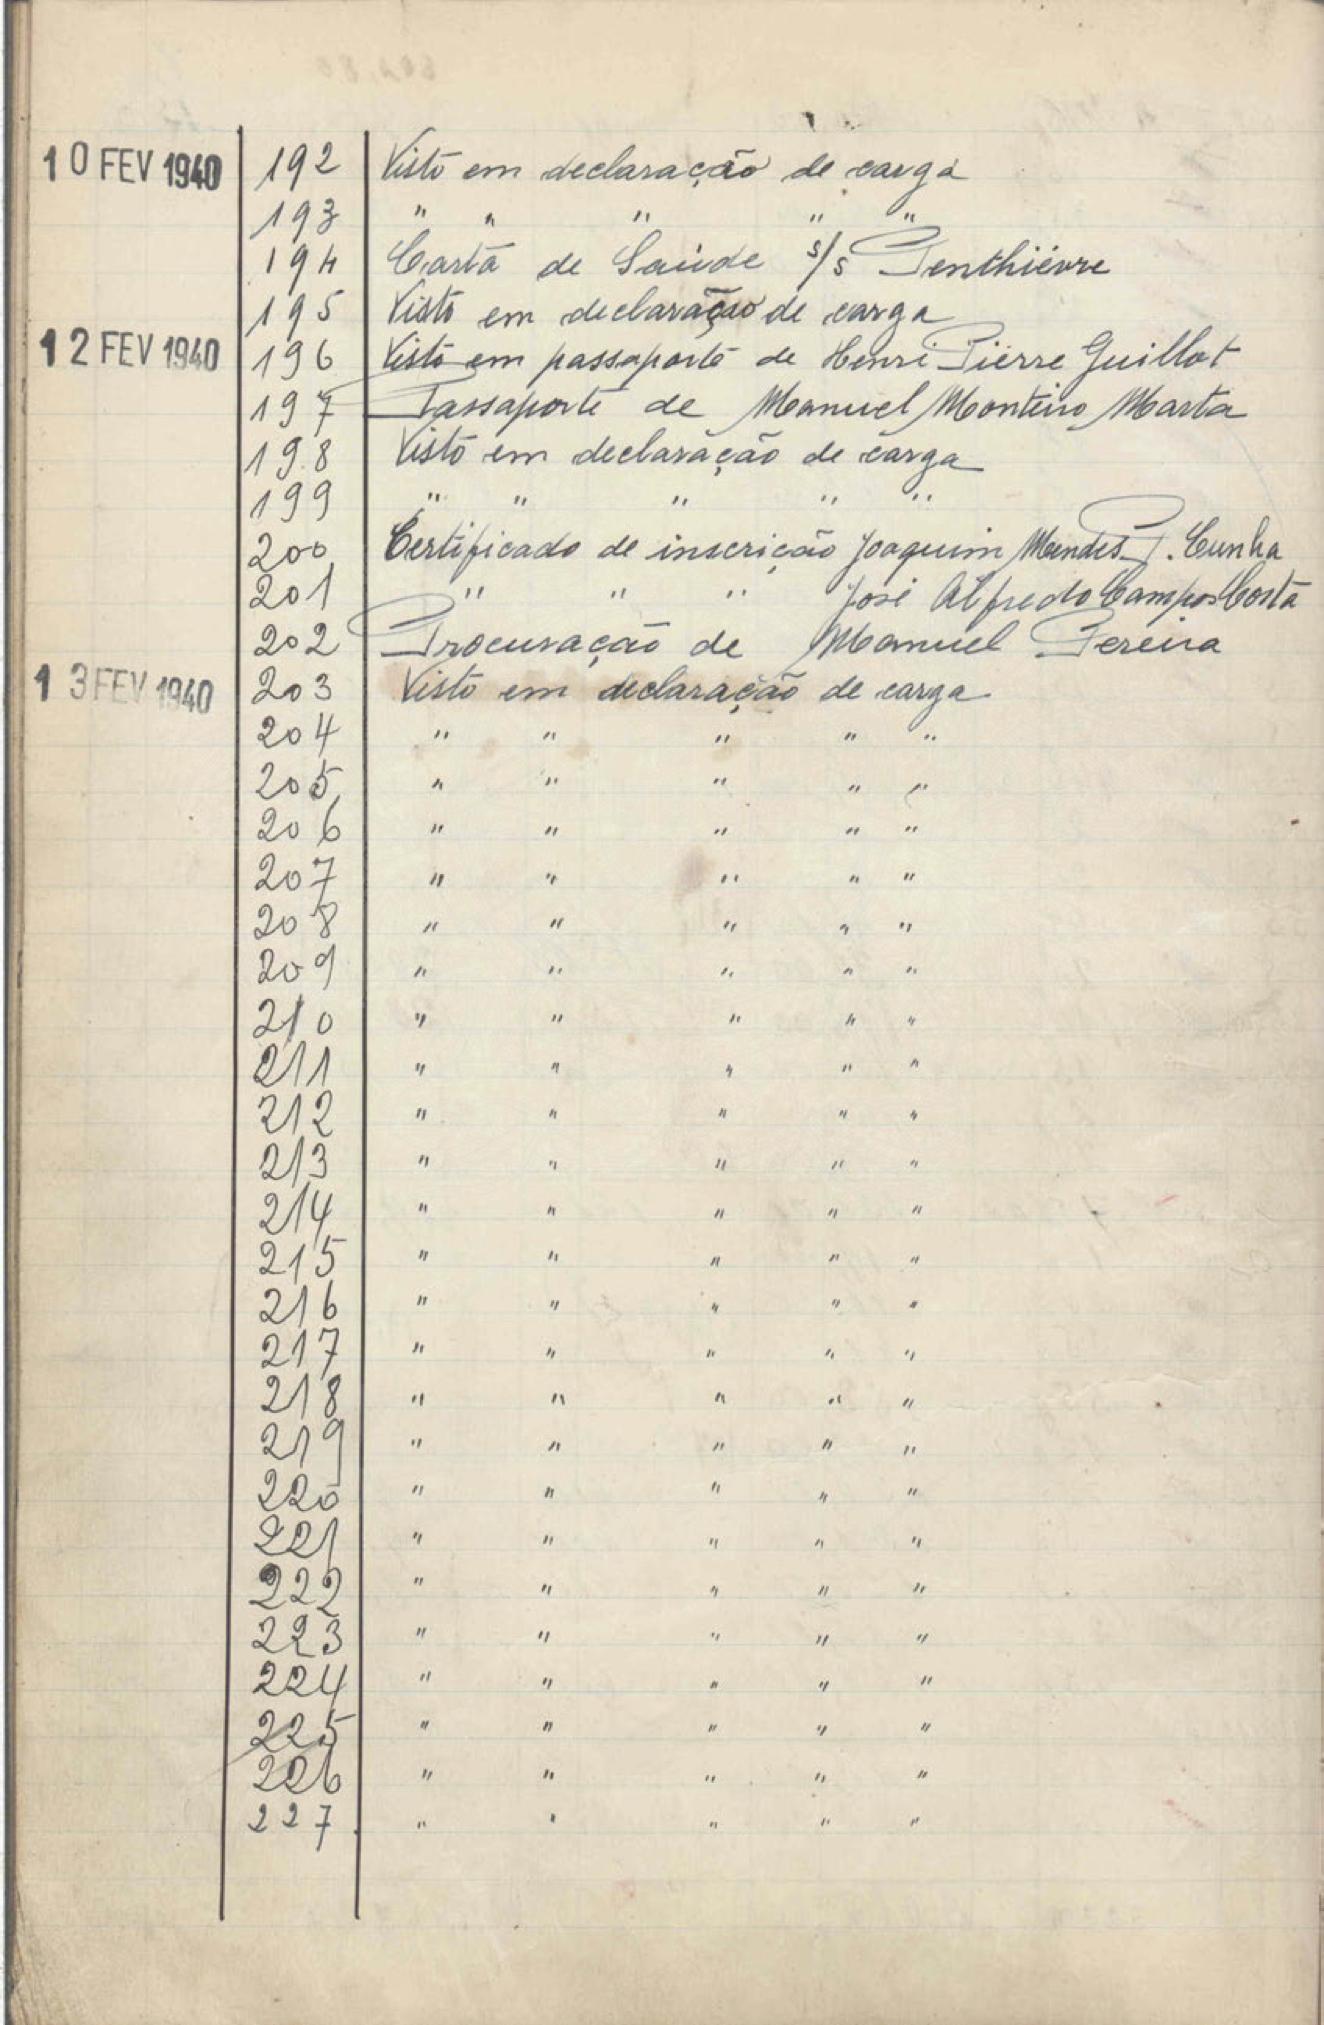 192-227